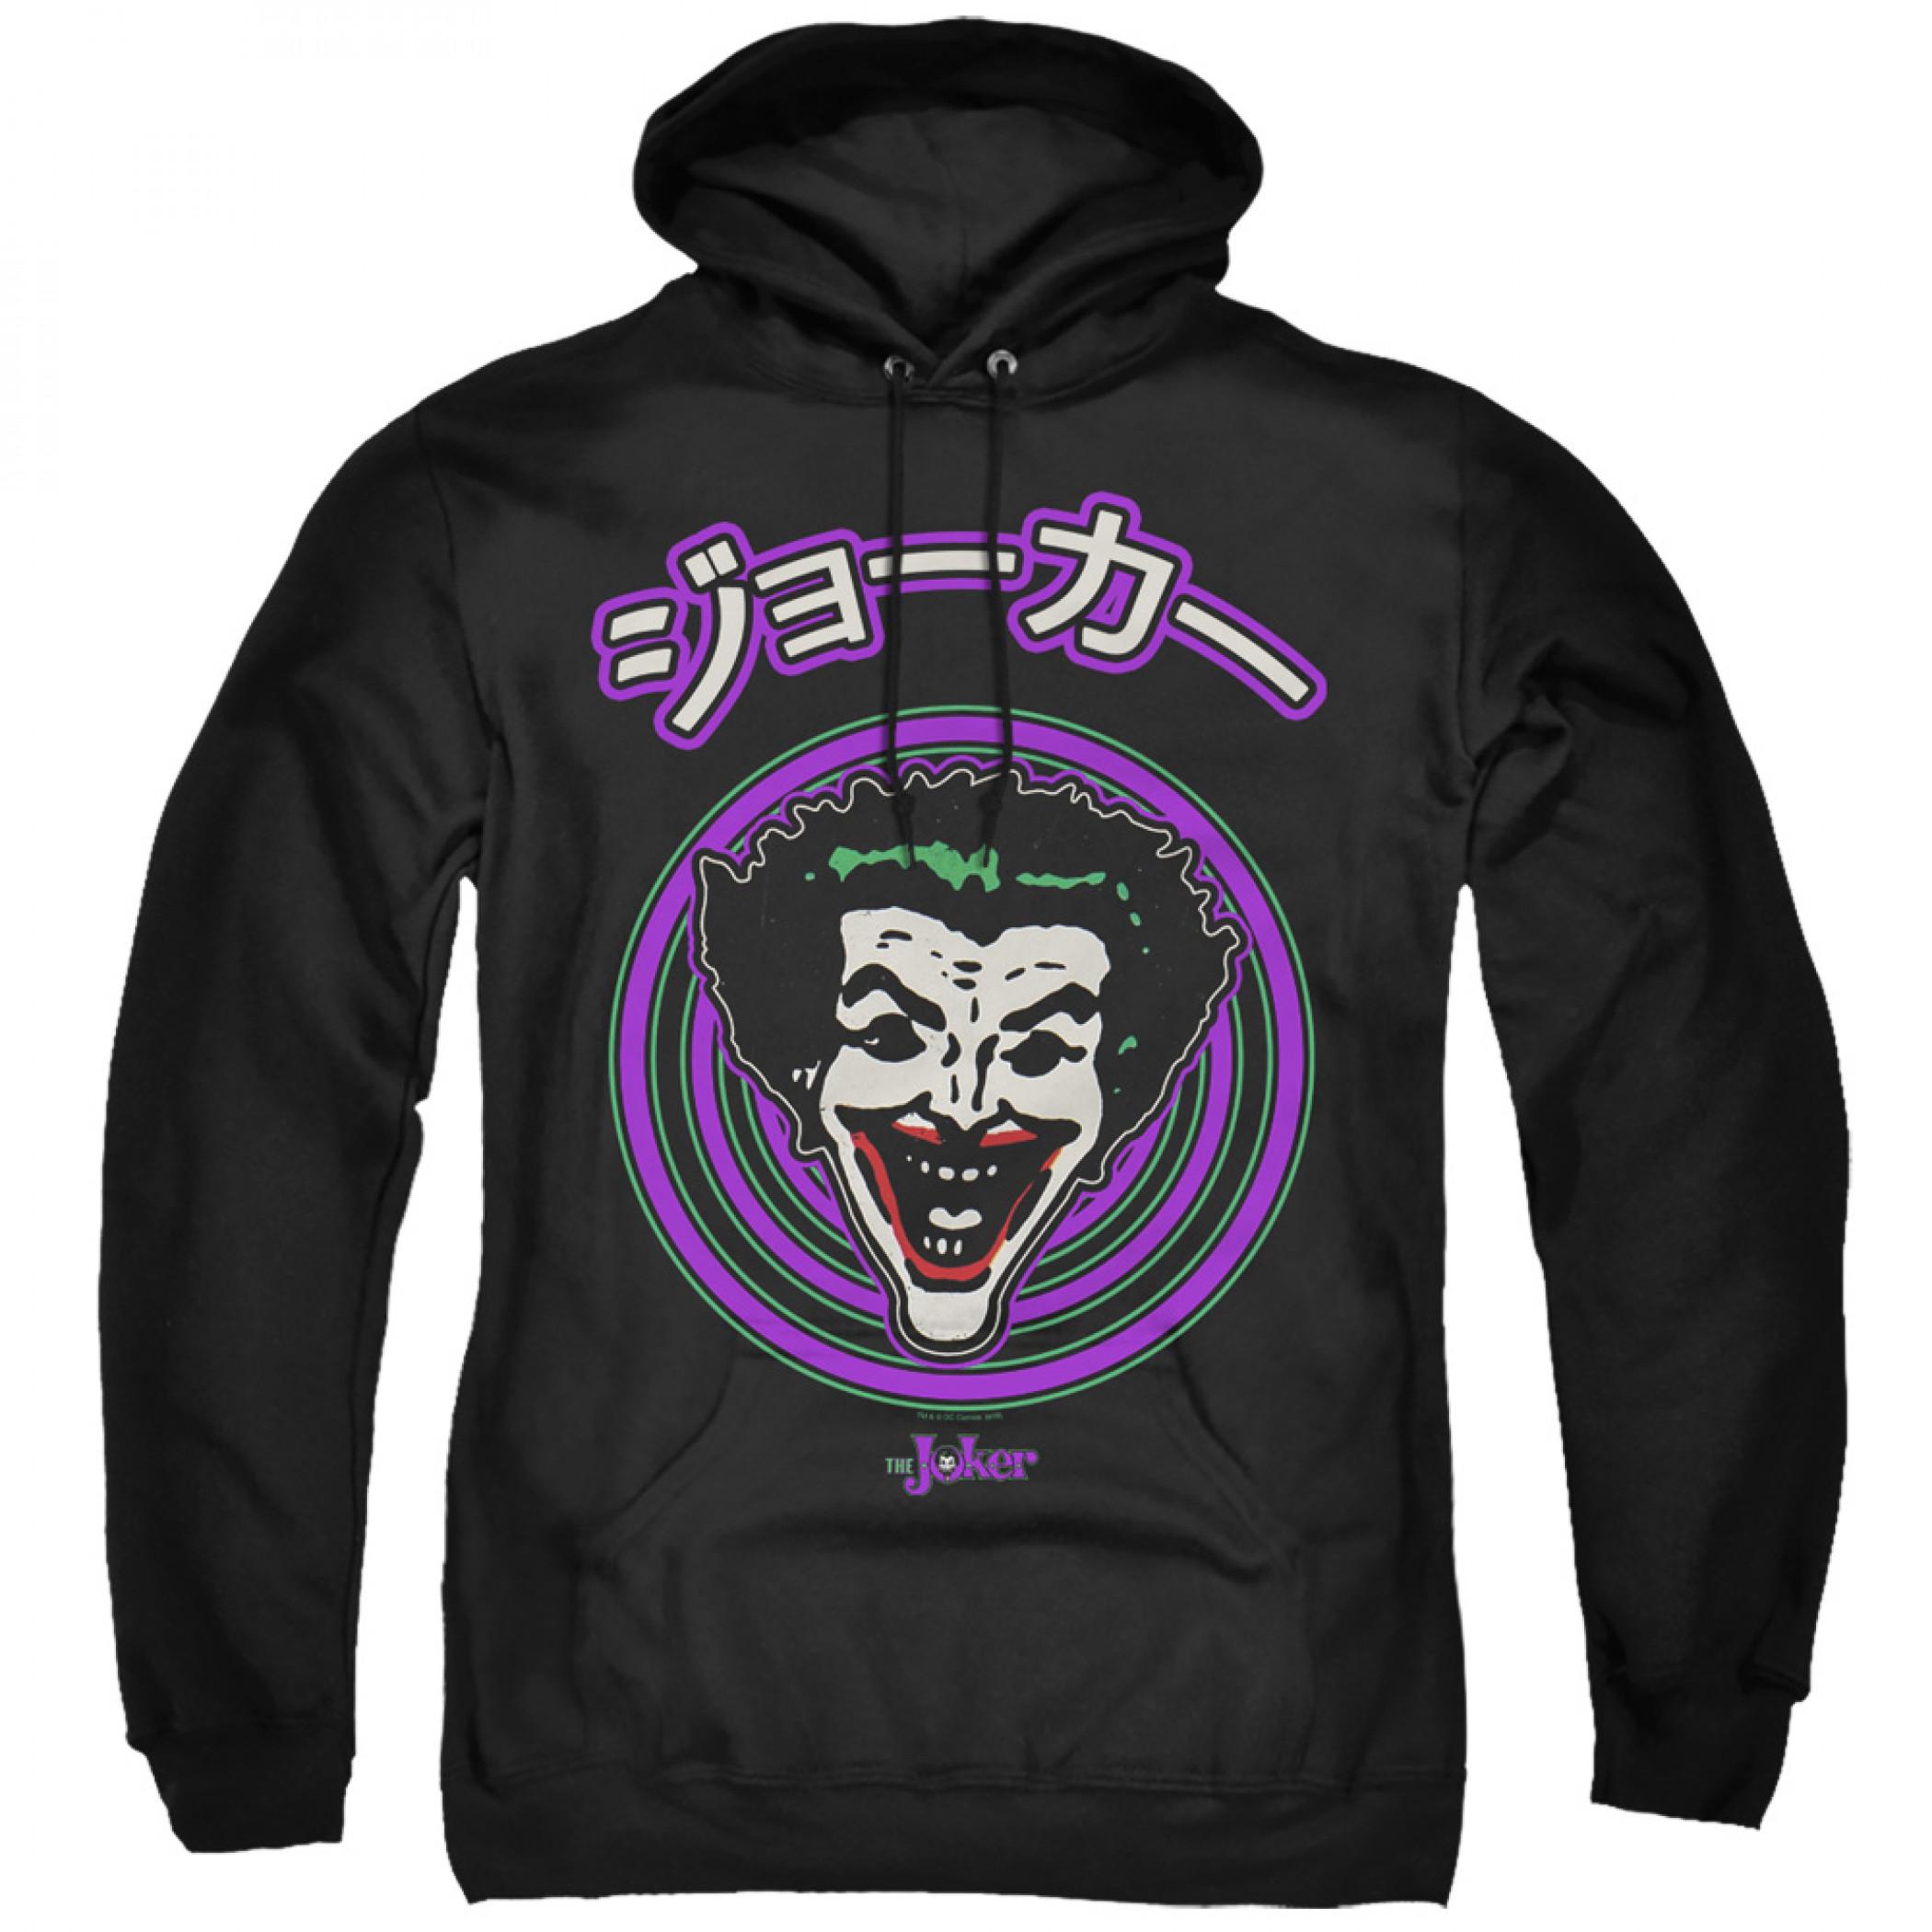 The Joker Kanji Black Hoodie